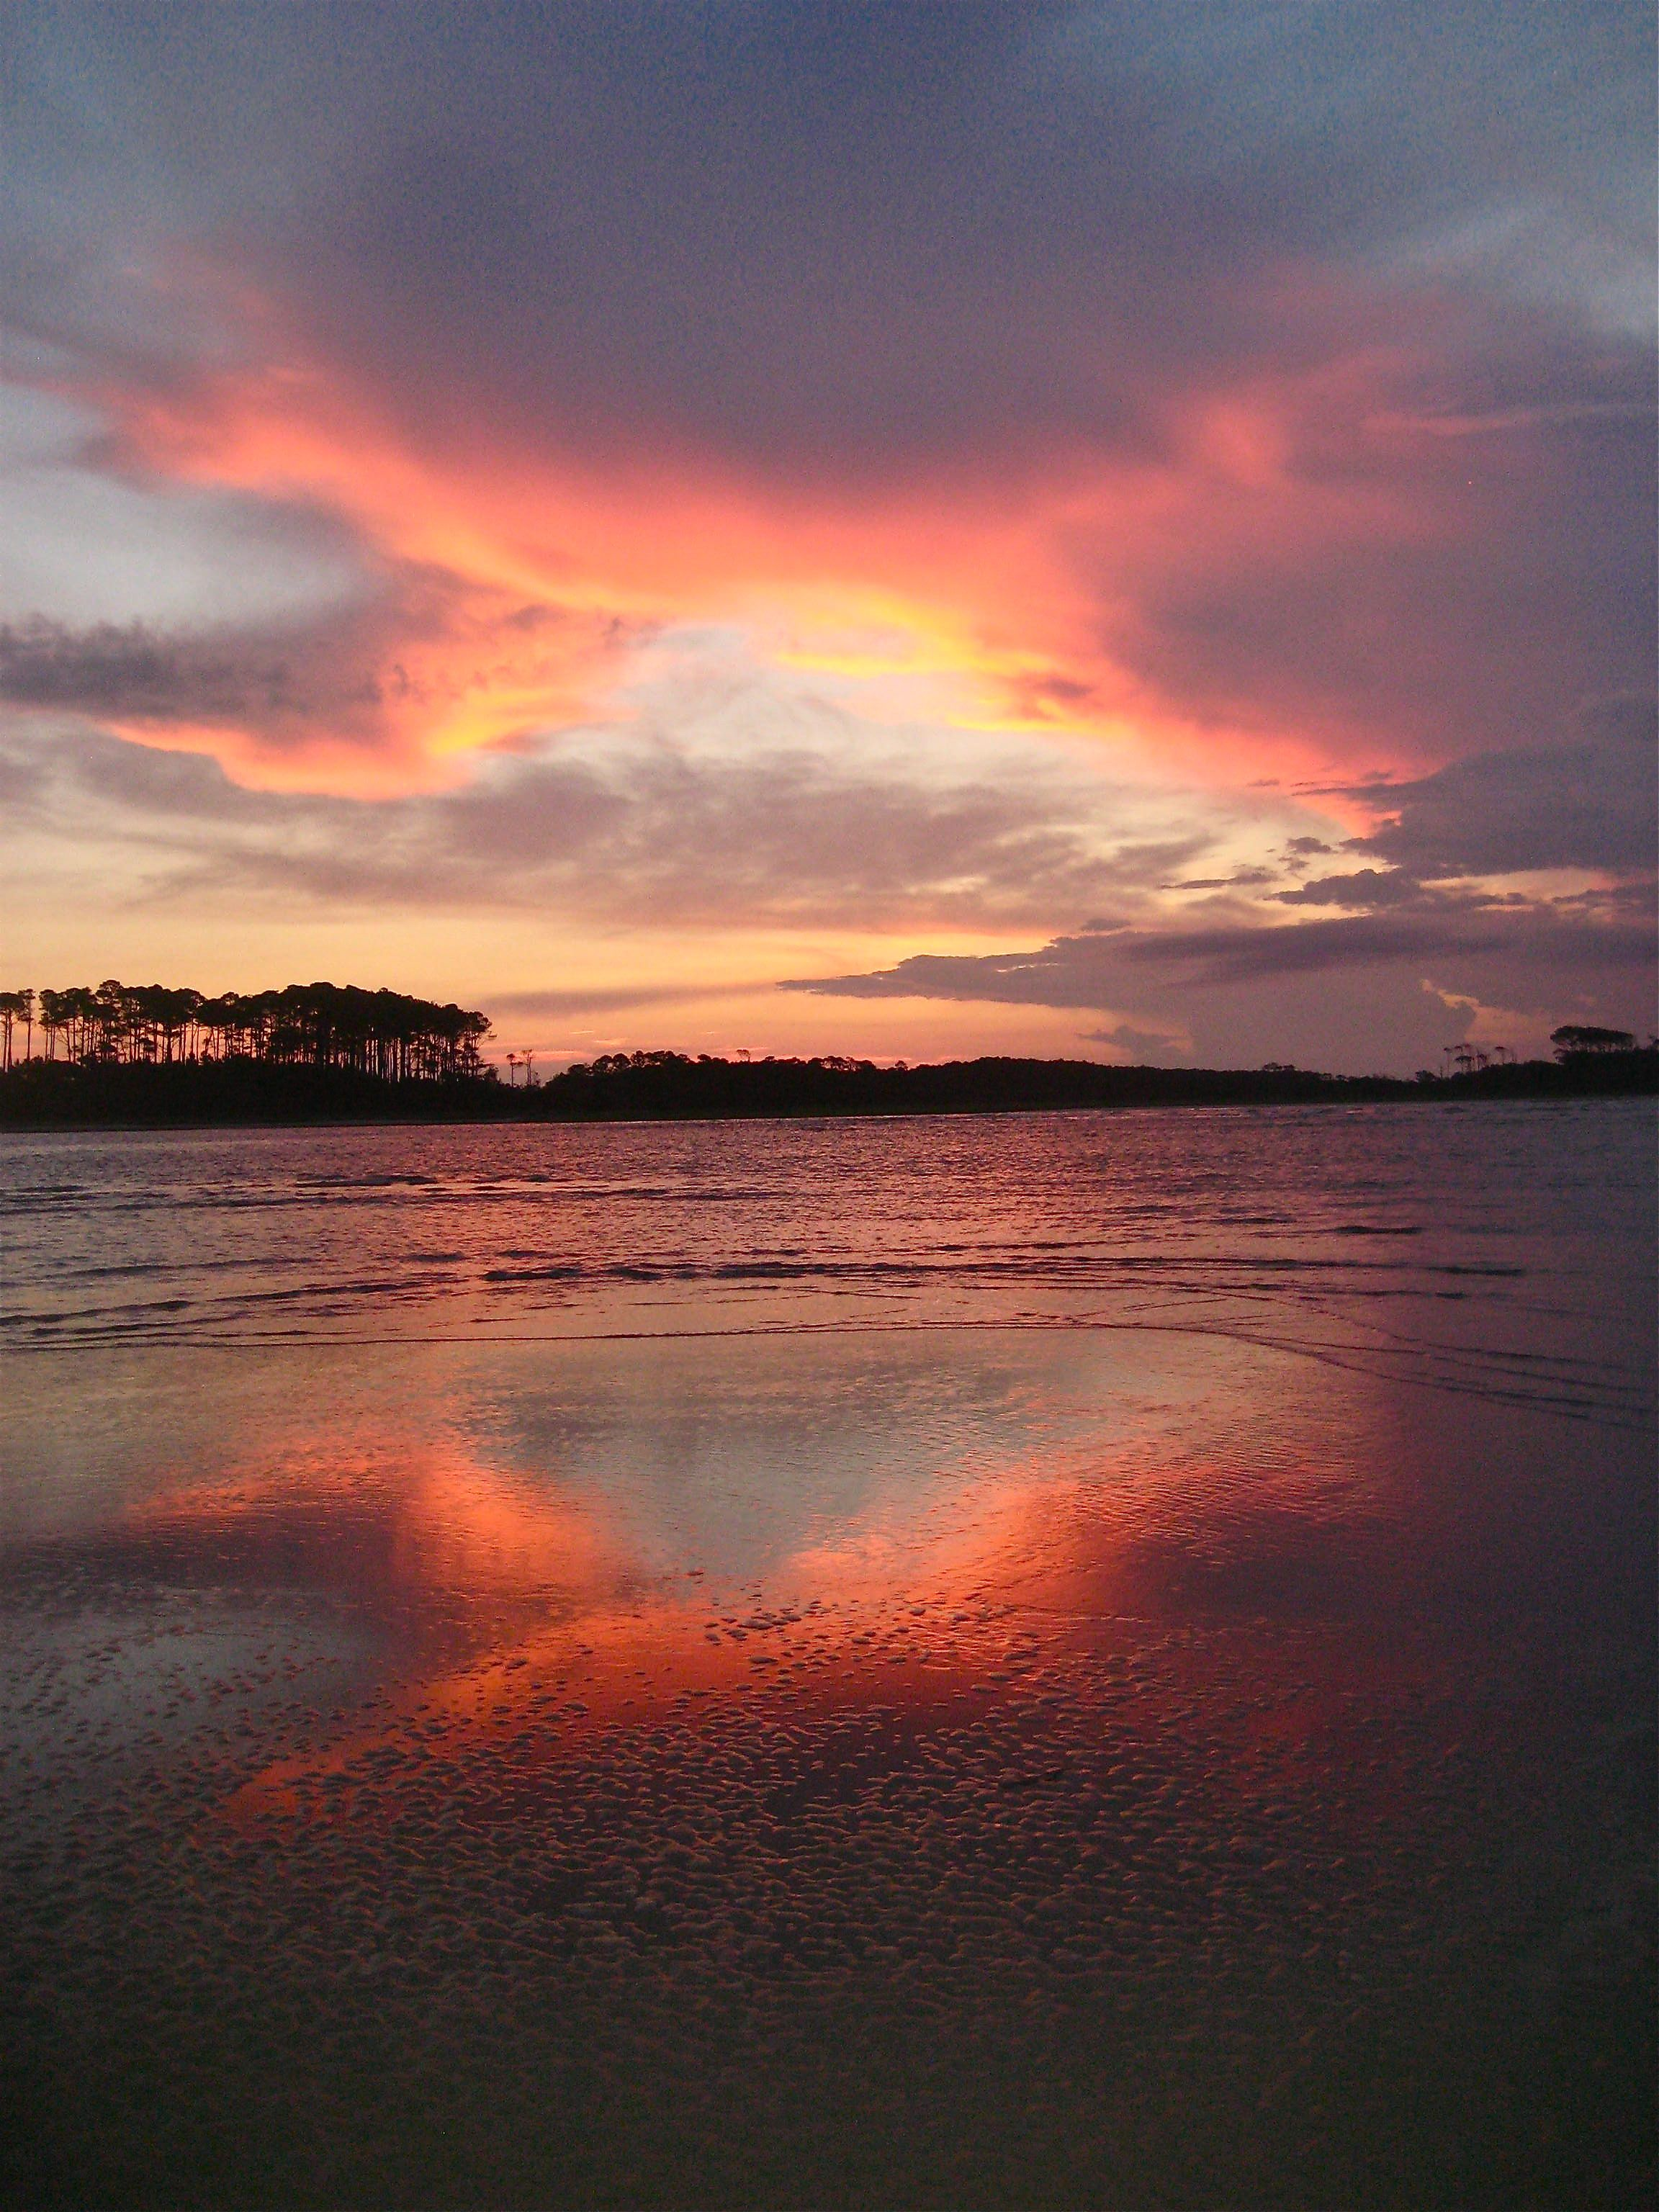 Cheap Flights To Myrtle Beach South Carolina 158 78 In: Cherry Grove, N Myrtle Beach SC Sunrise